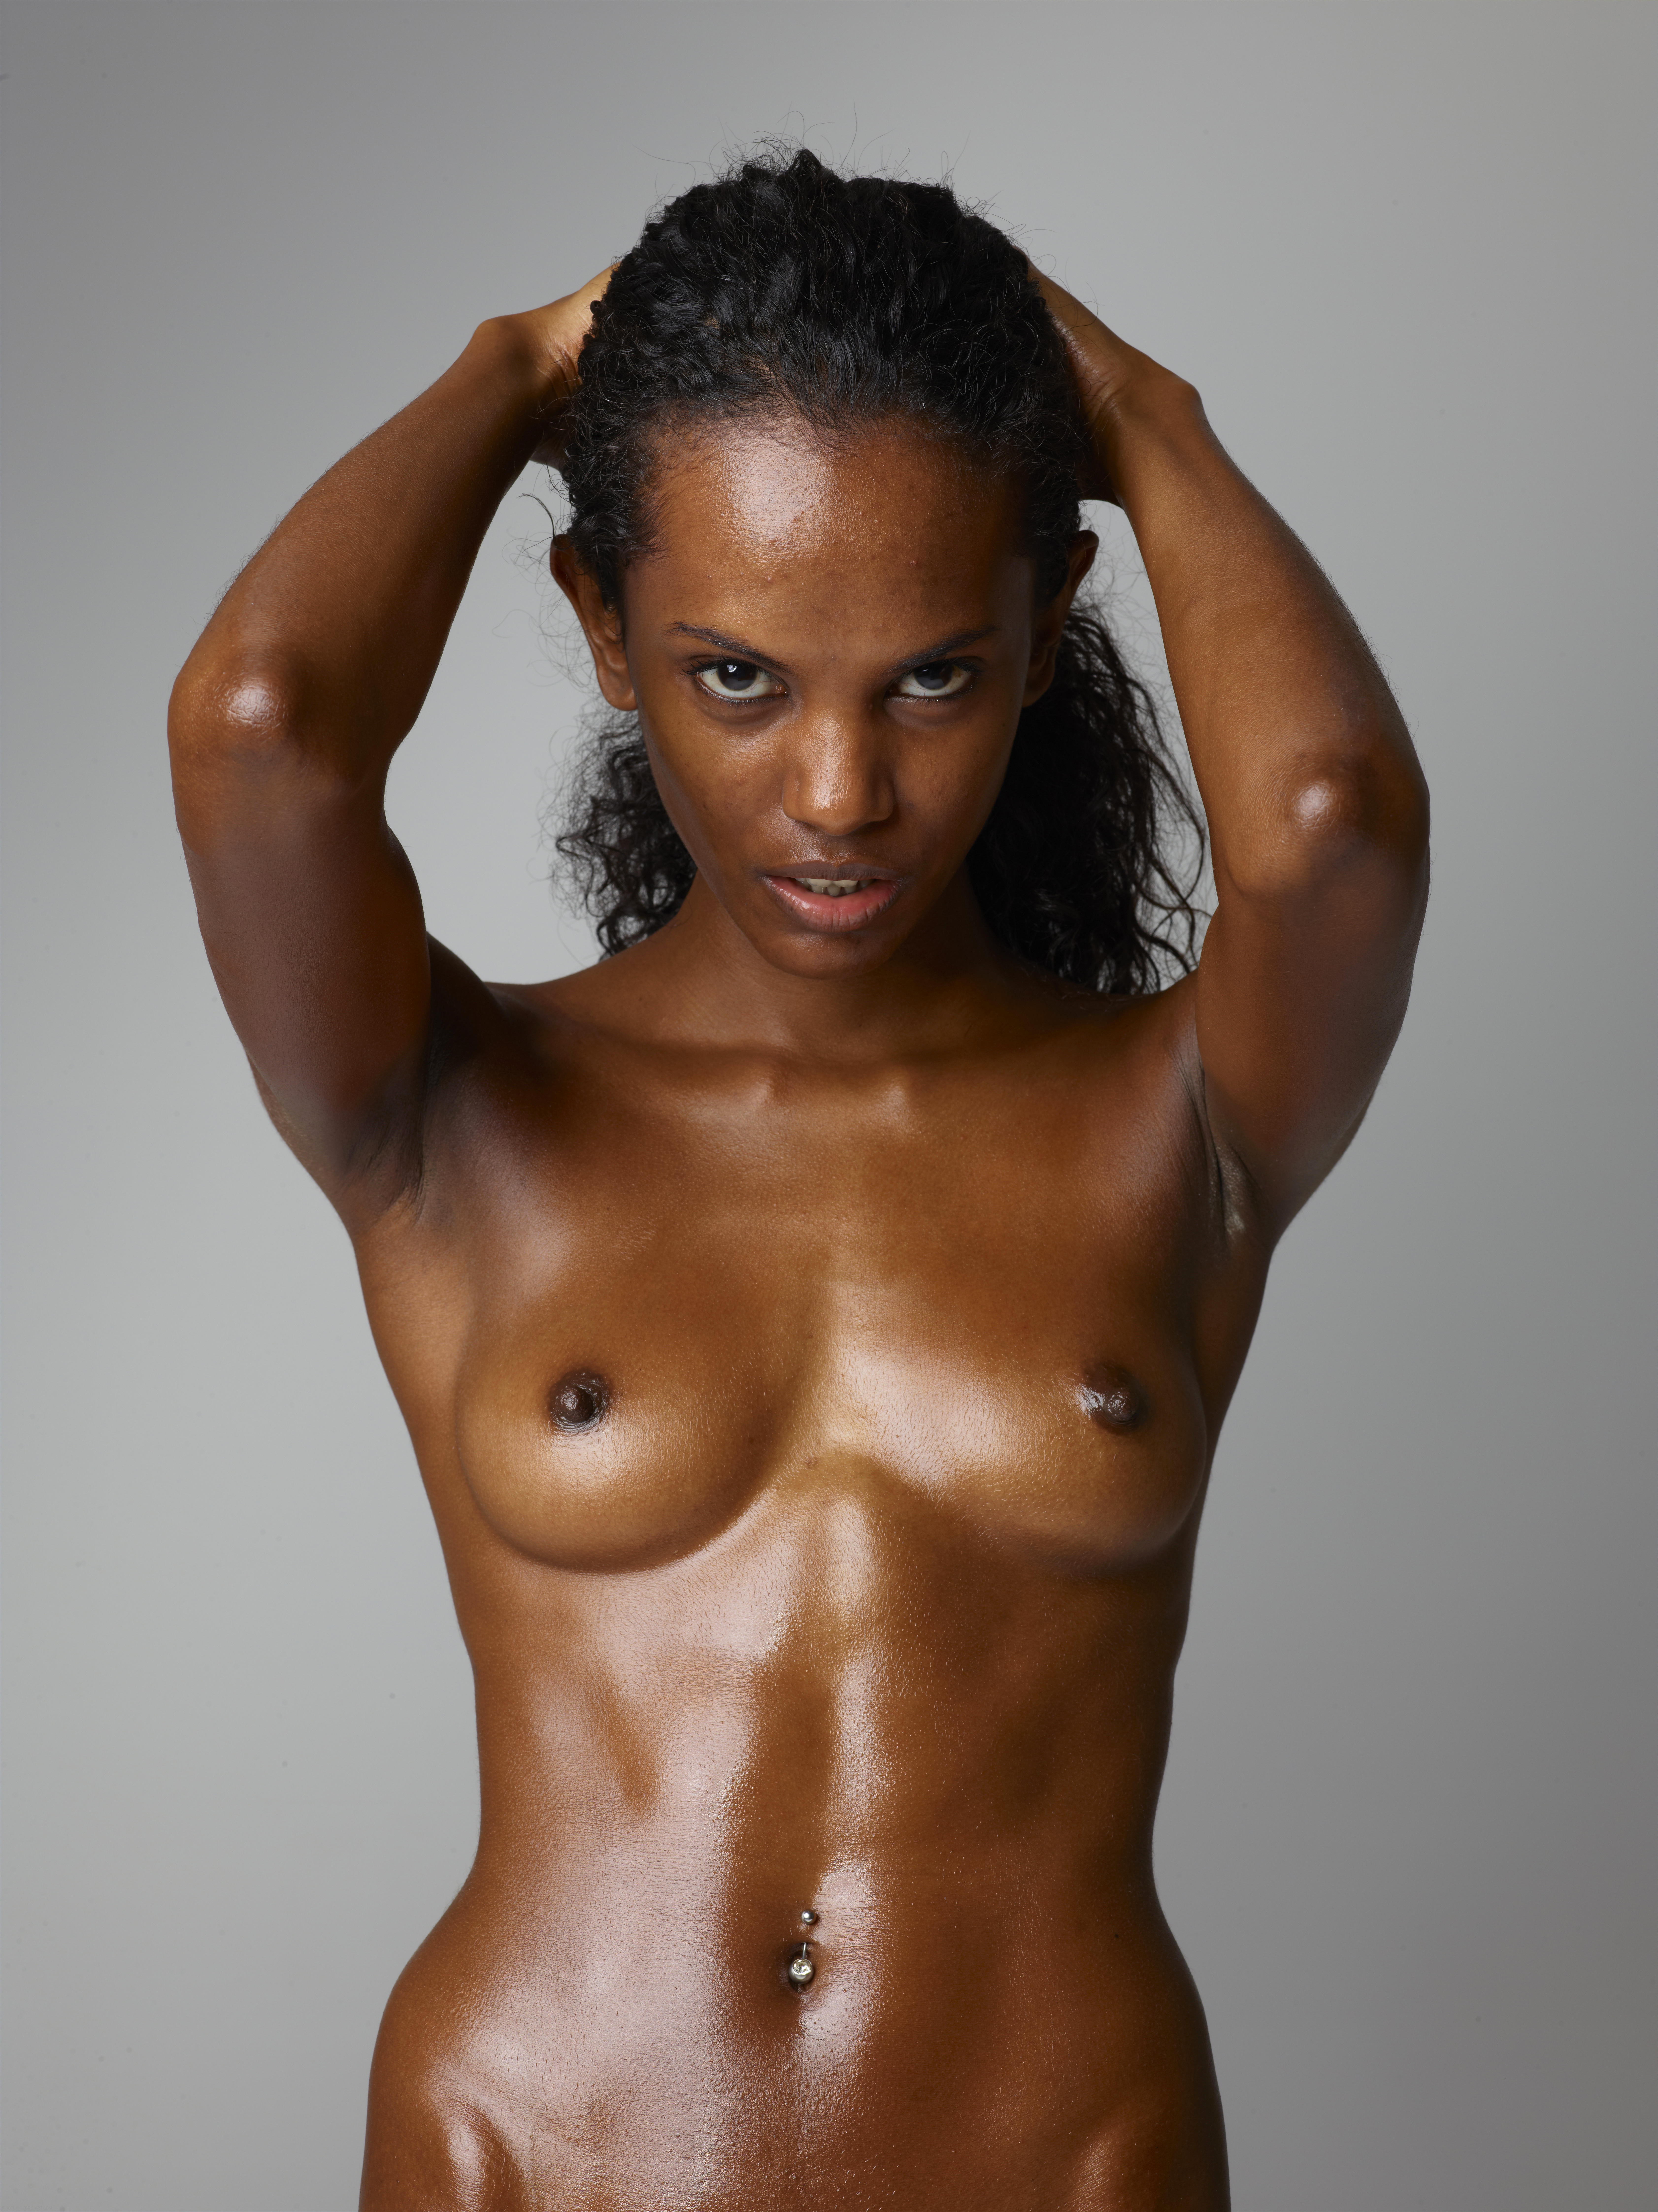 Nude black female fitness models